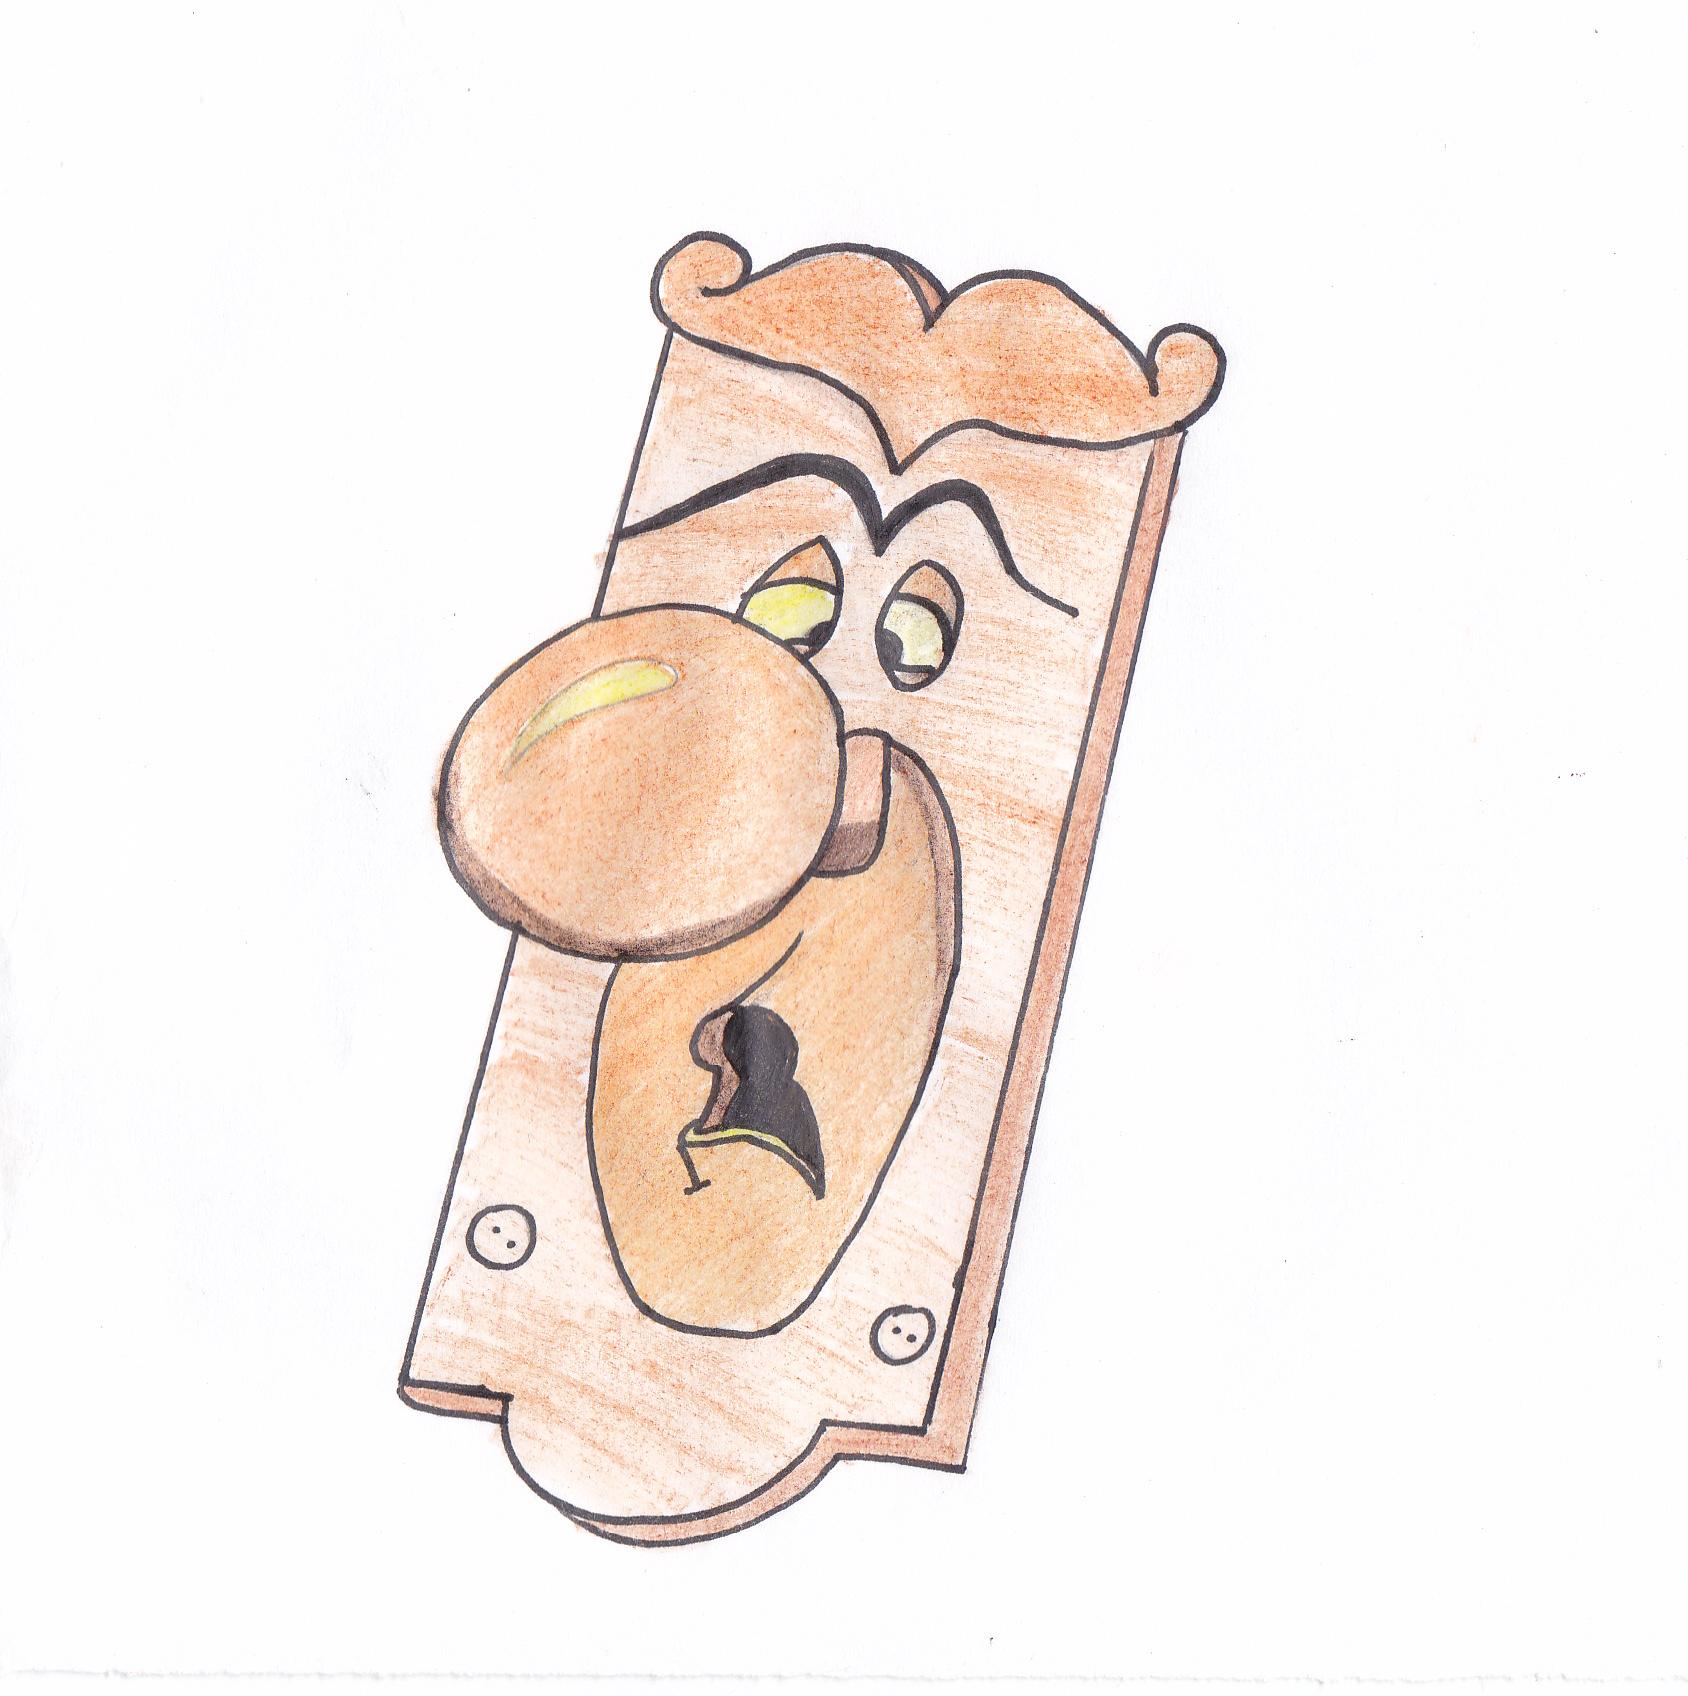 Doorknob Alice in wonderland by lacunacoil4 on DeviantArt